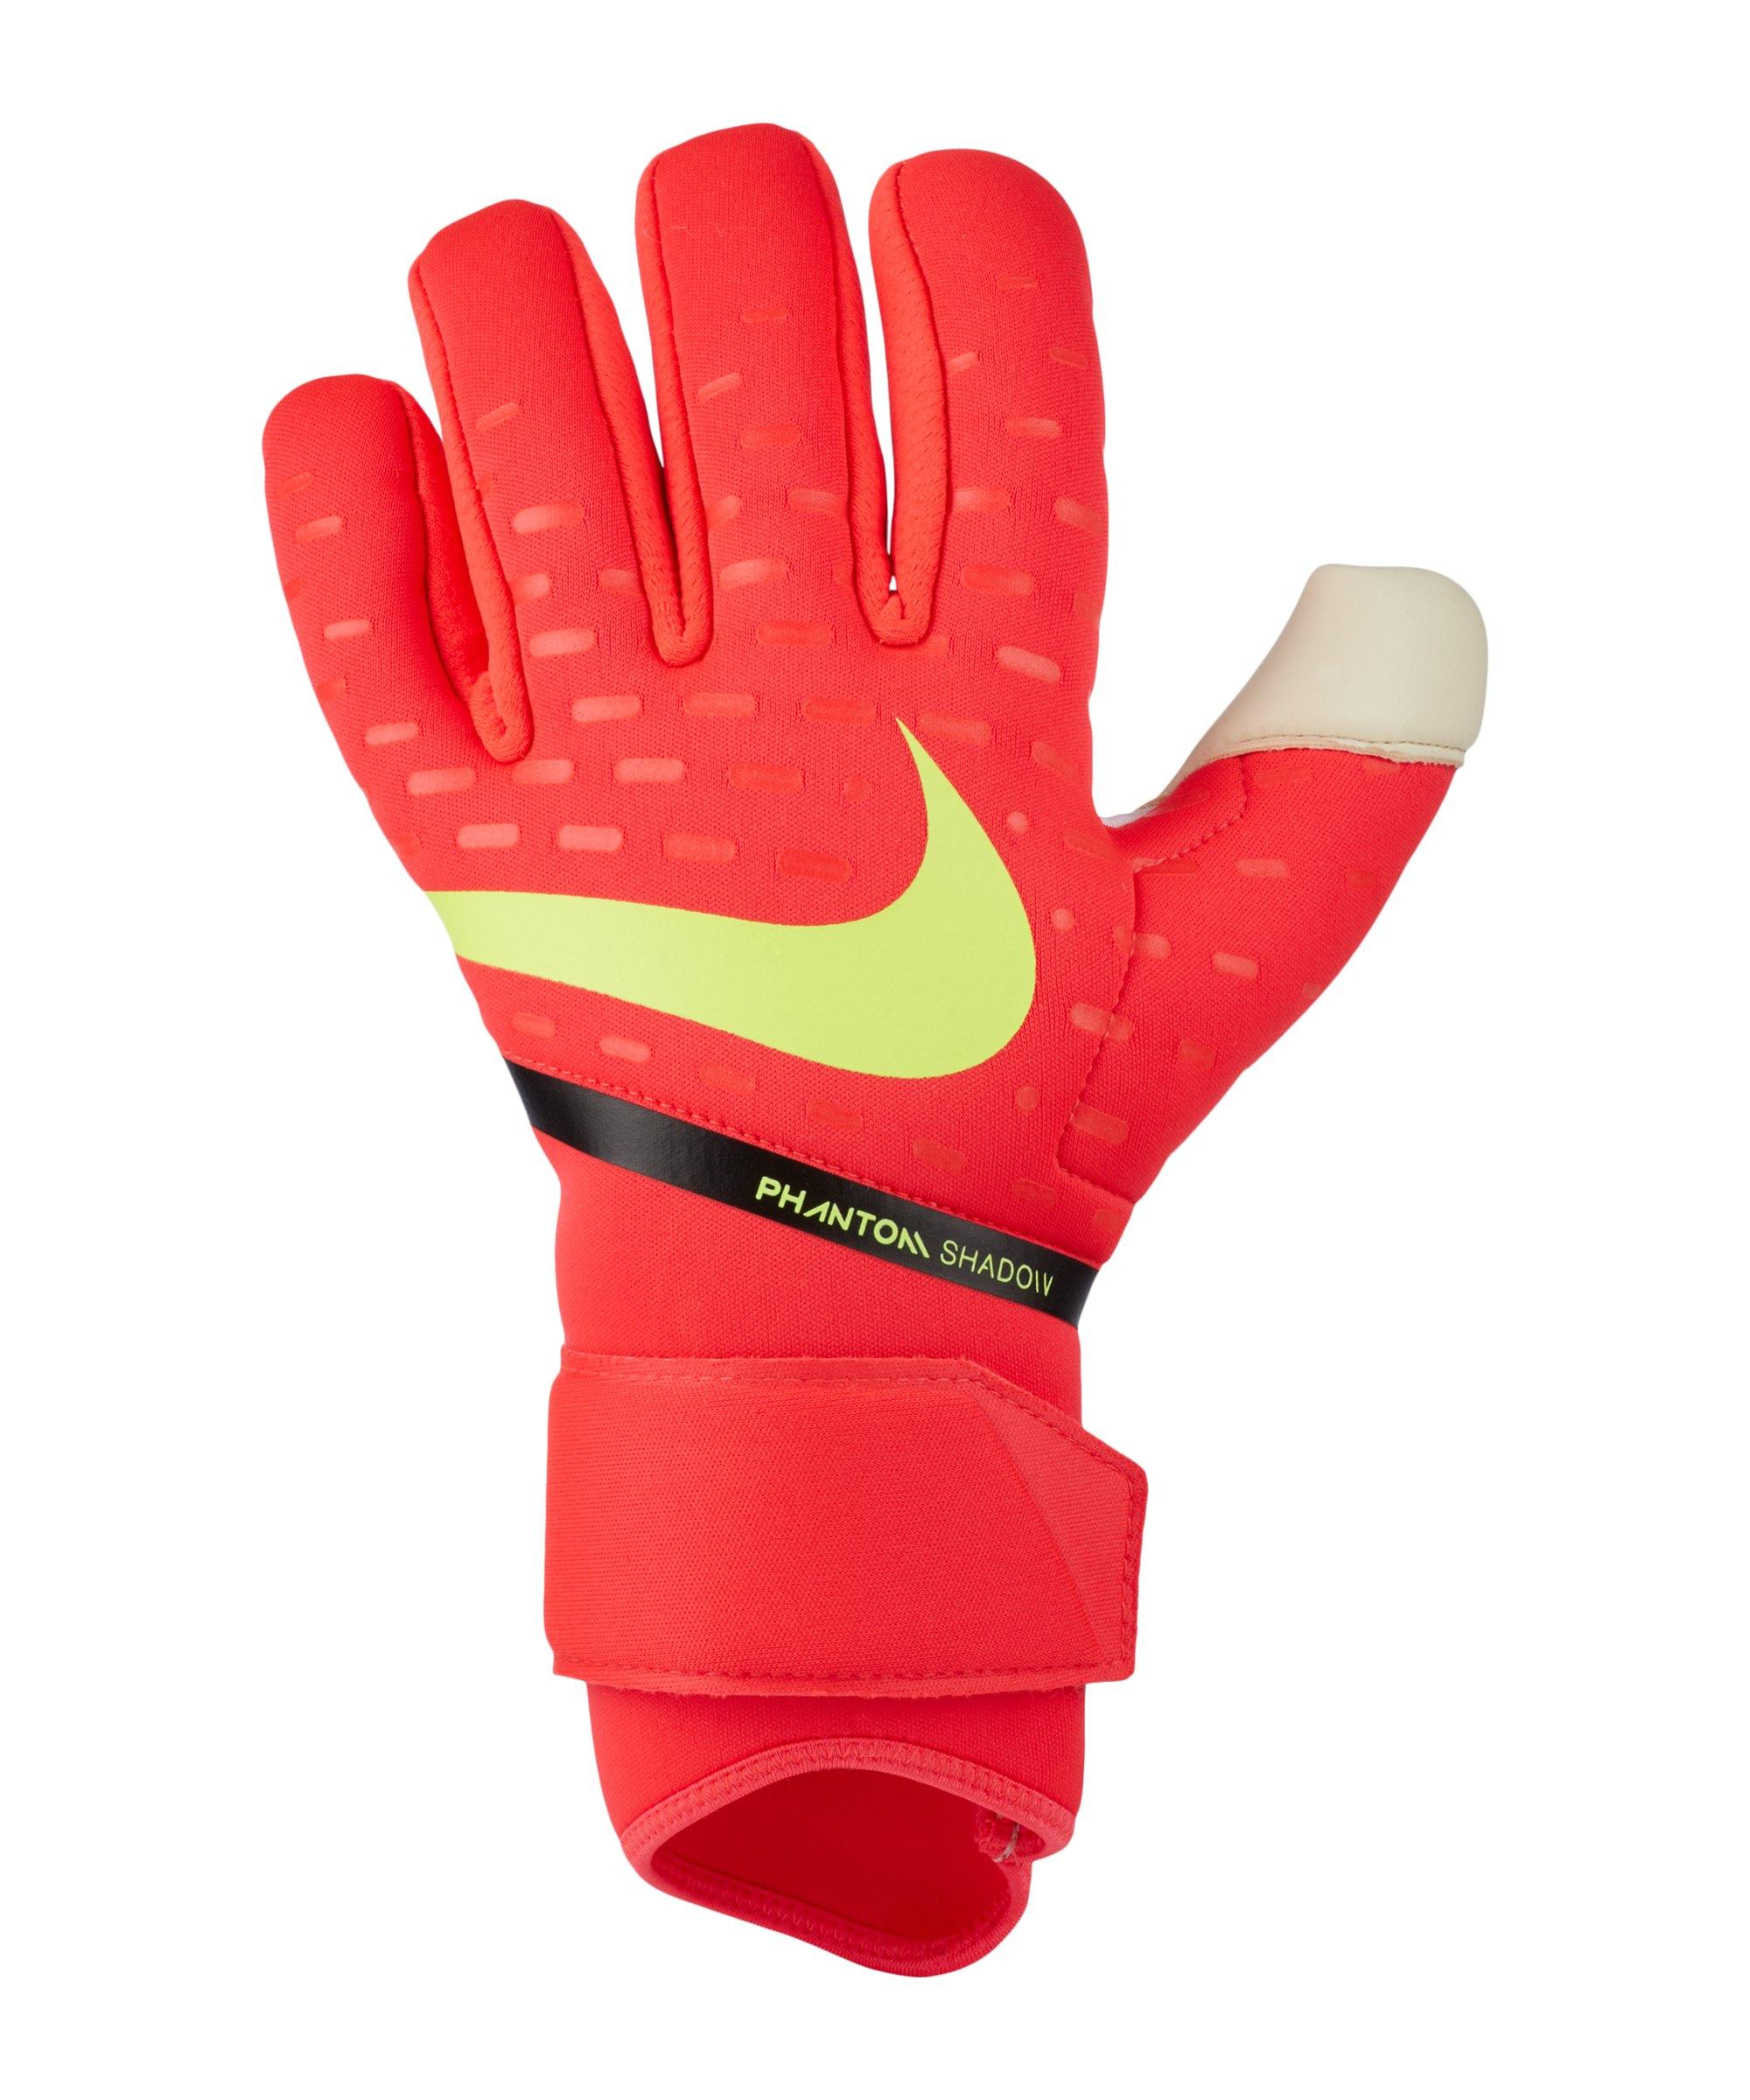 Nike Phantom Shadow Torwarthandschuh Rot F635 - rot